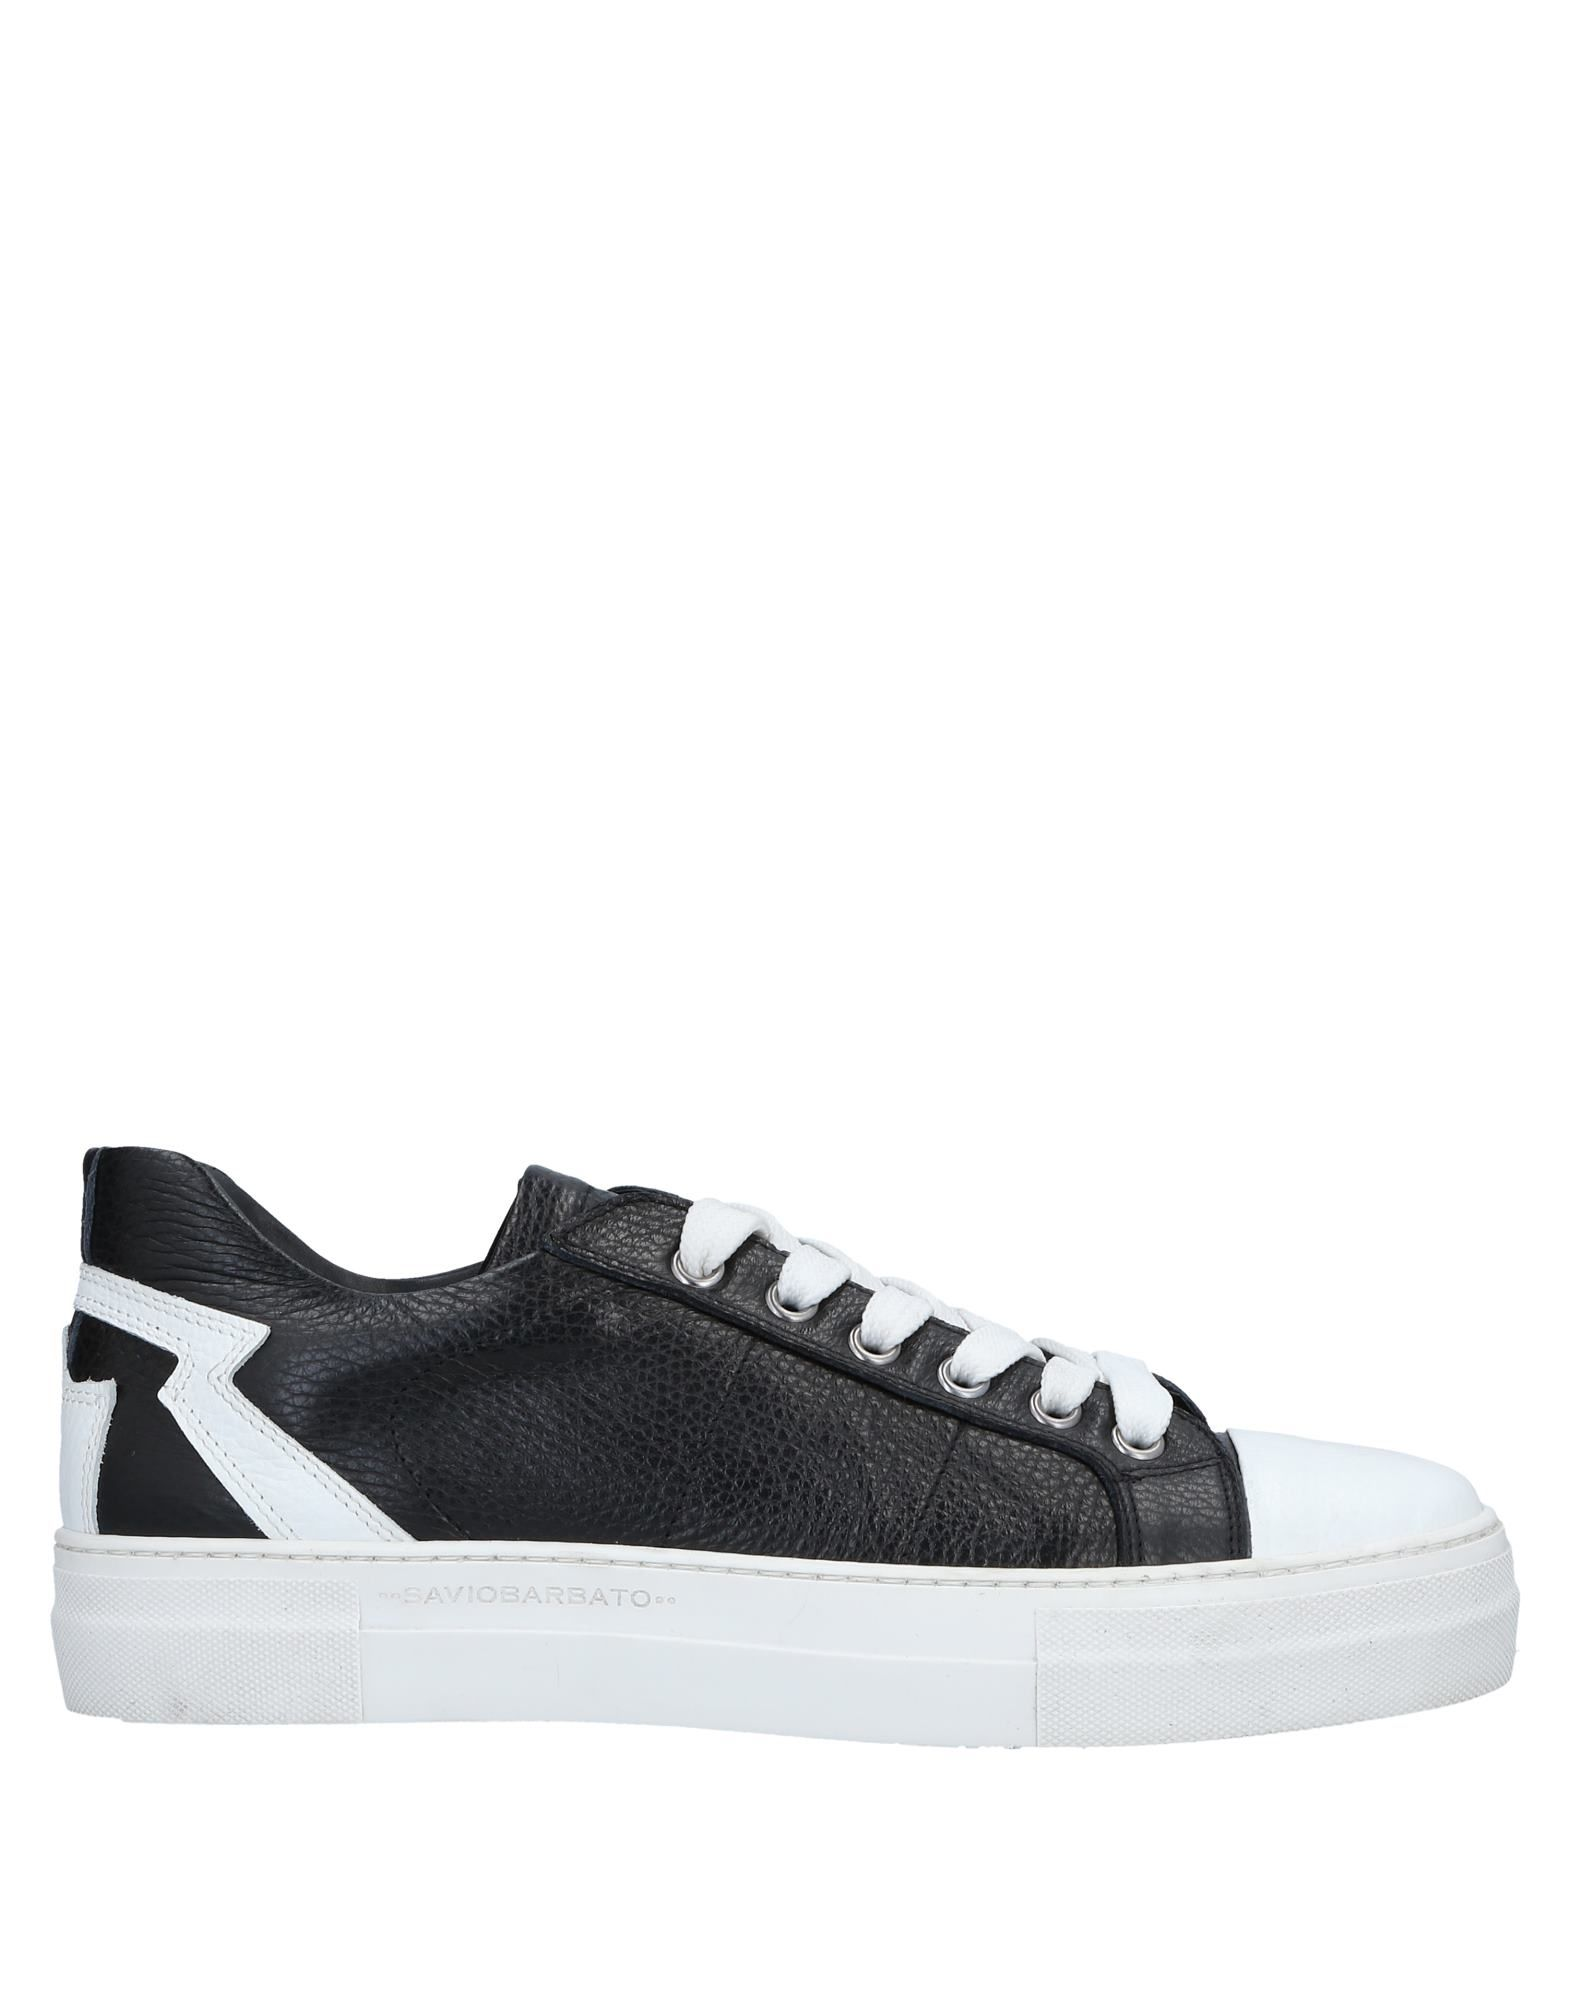 Rabatt echte Schuhe Savio Barbato Sneakers Herren  11535499DQ